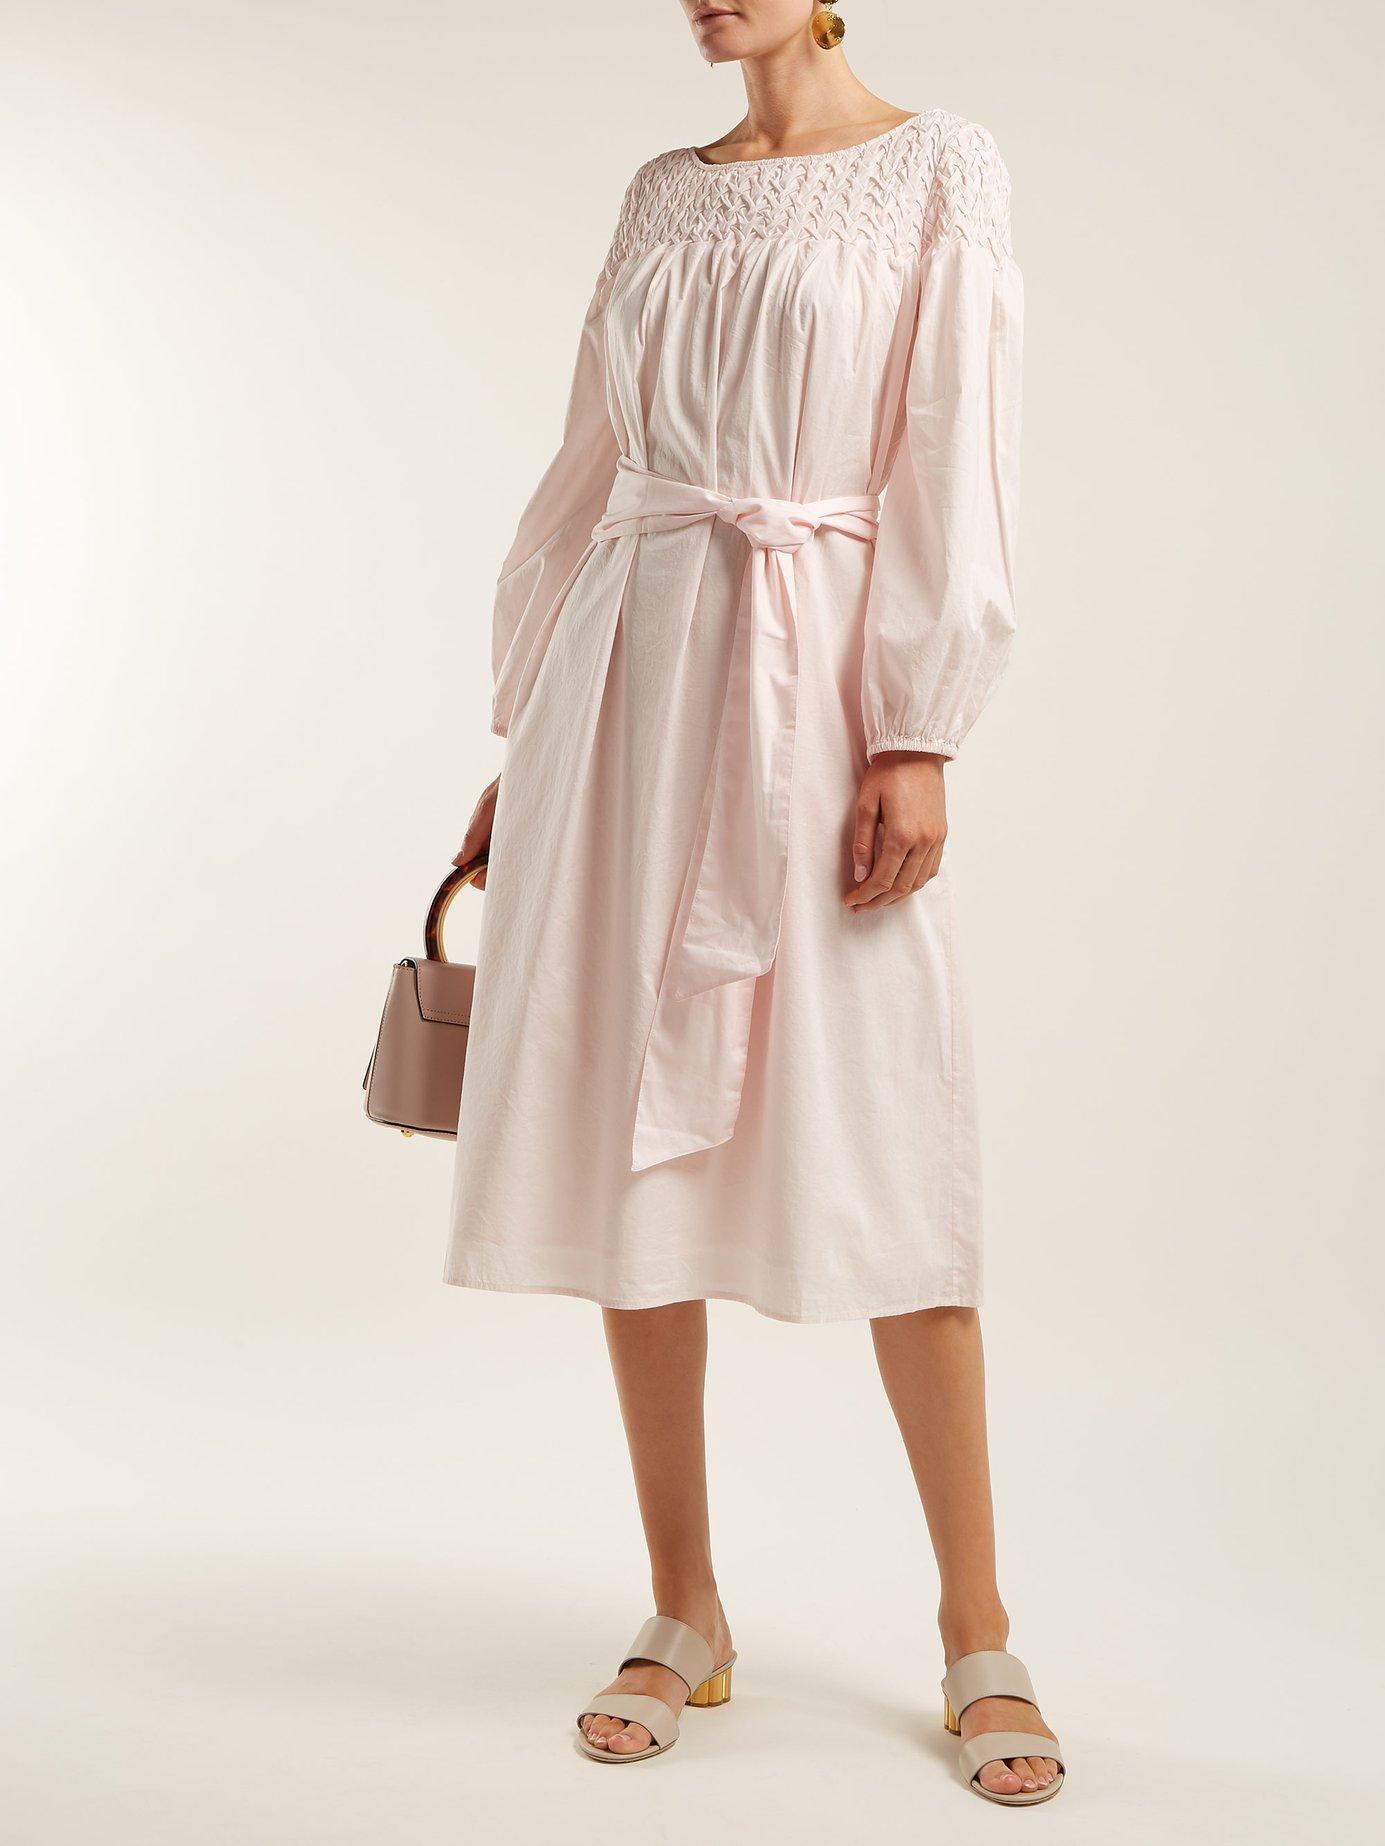 Bonaire belted smock dress by Merlette